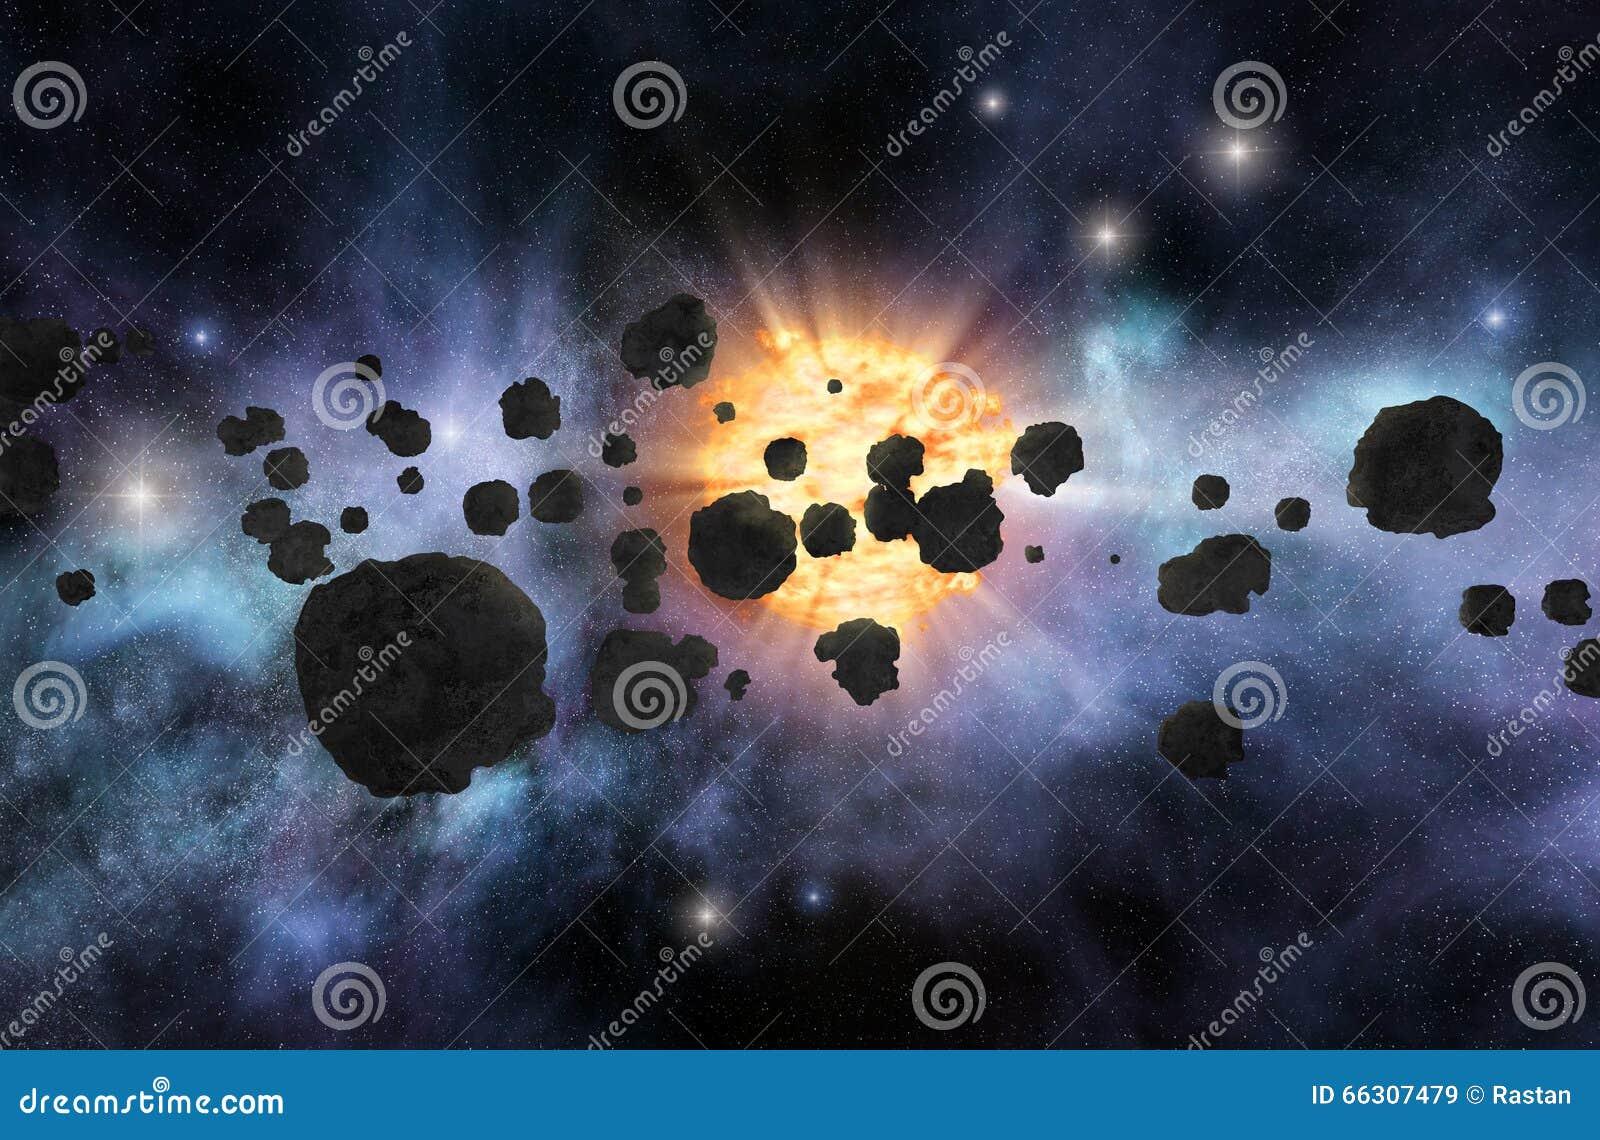 asteroid belt white background - photo #15